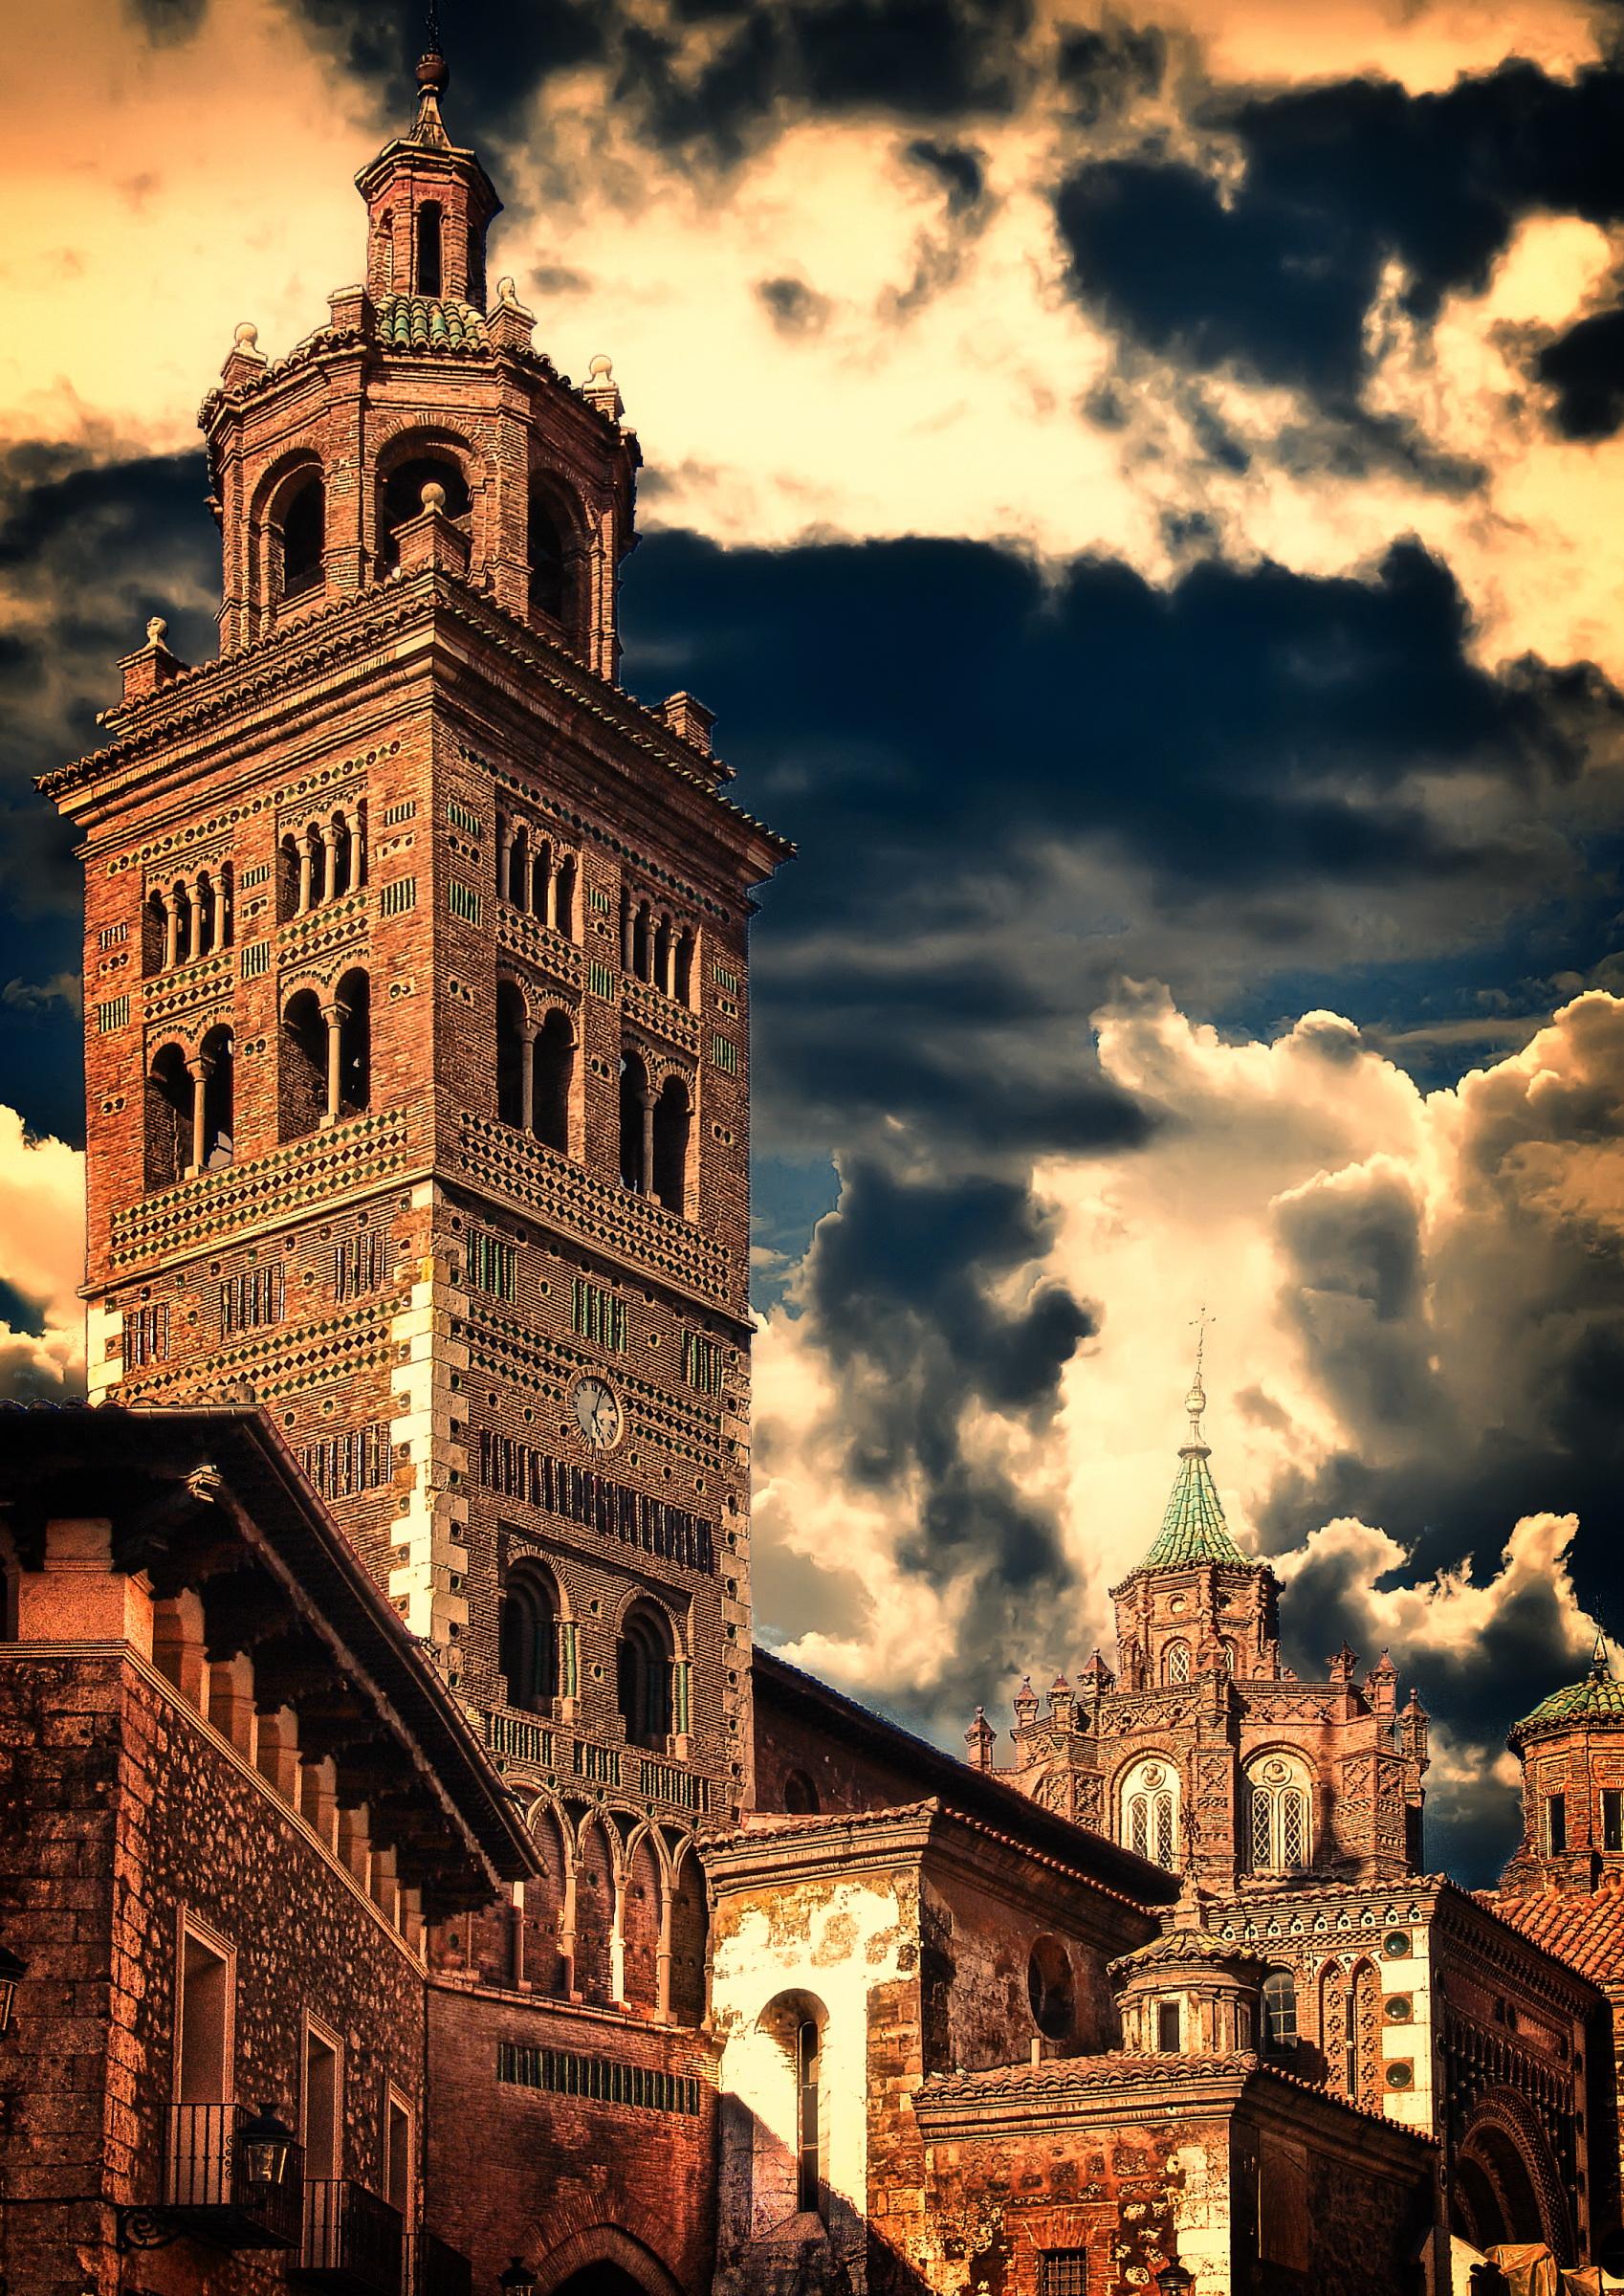 http://upload.wikimedia.org/wikipedia/commons/c/cb/Catedral_de_Teruel.jpg